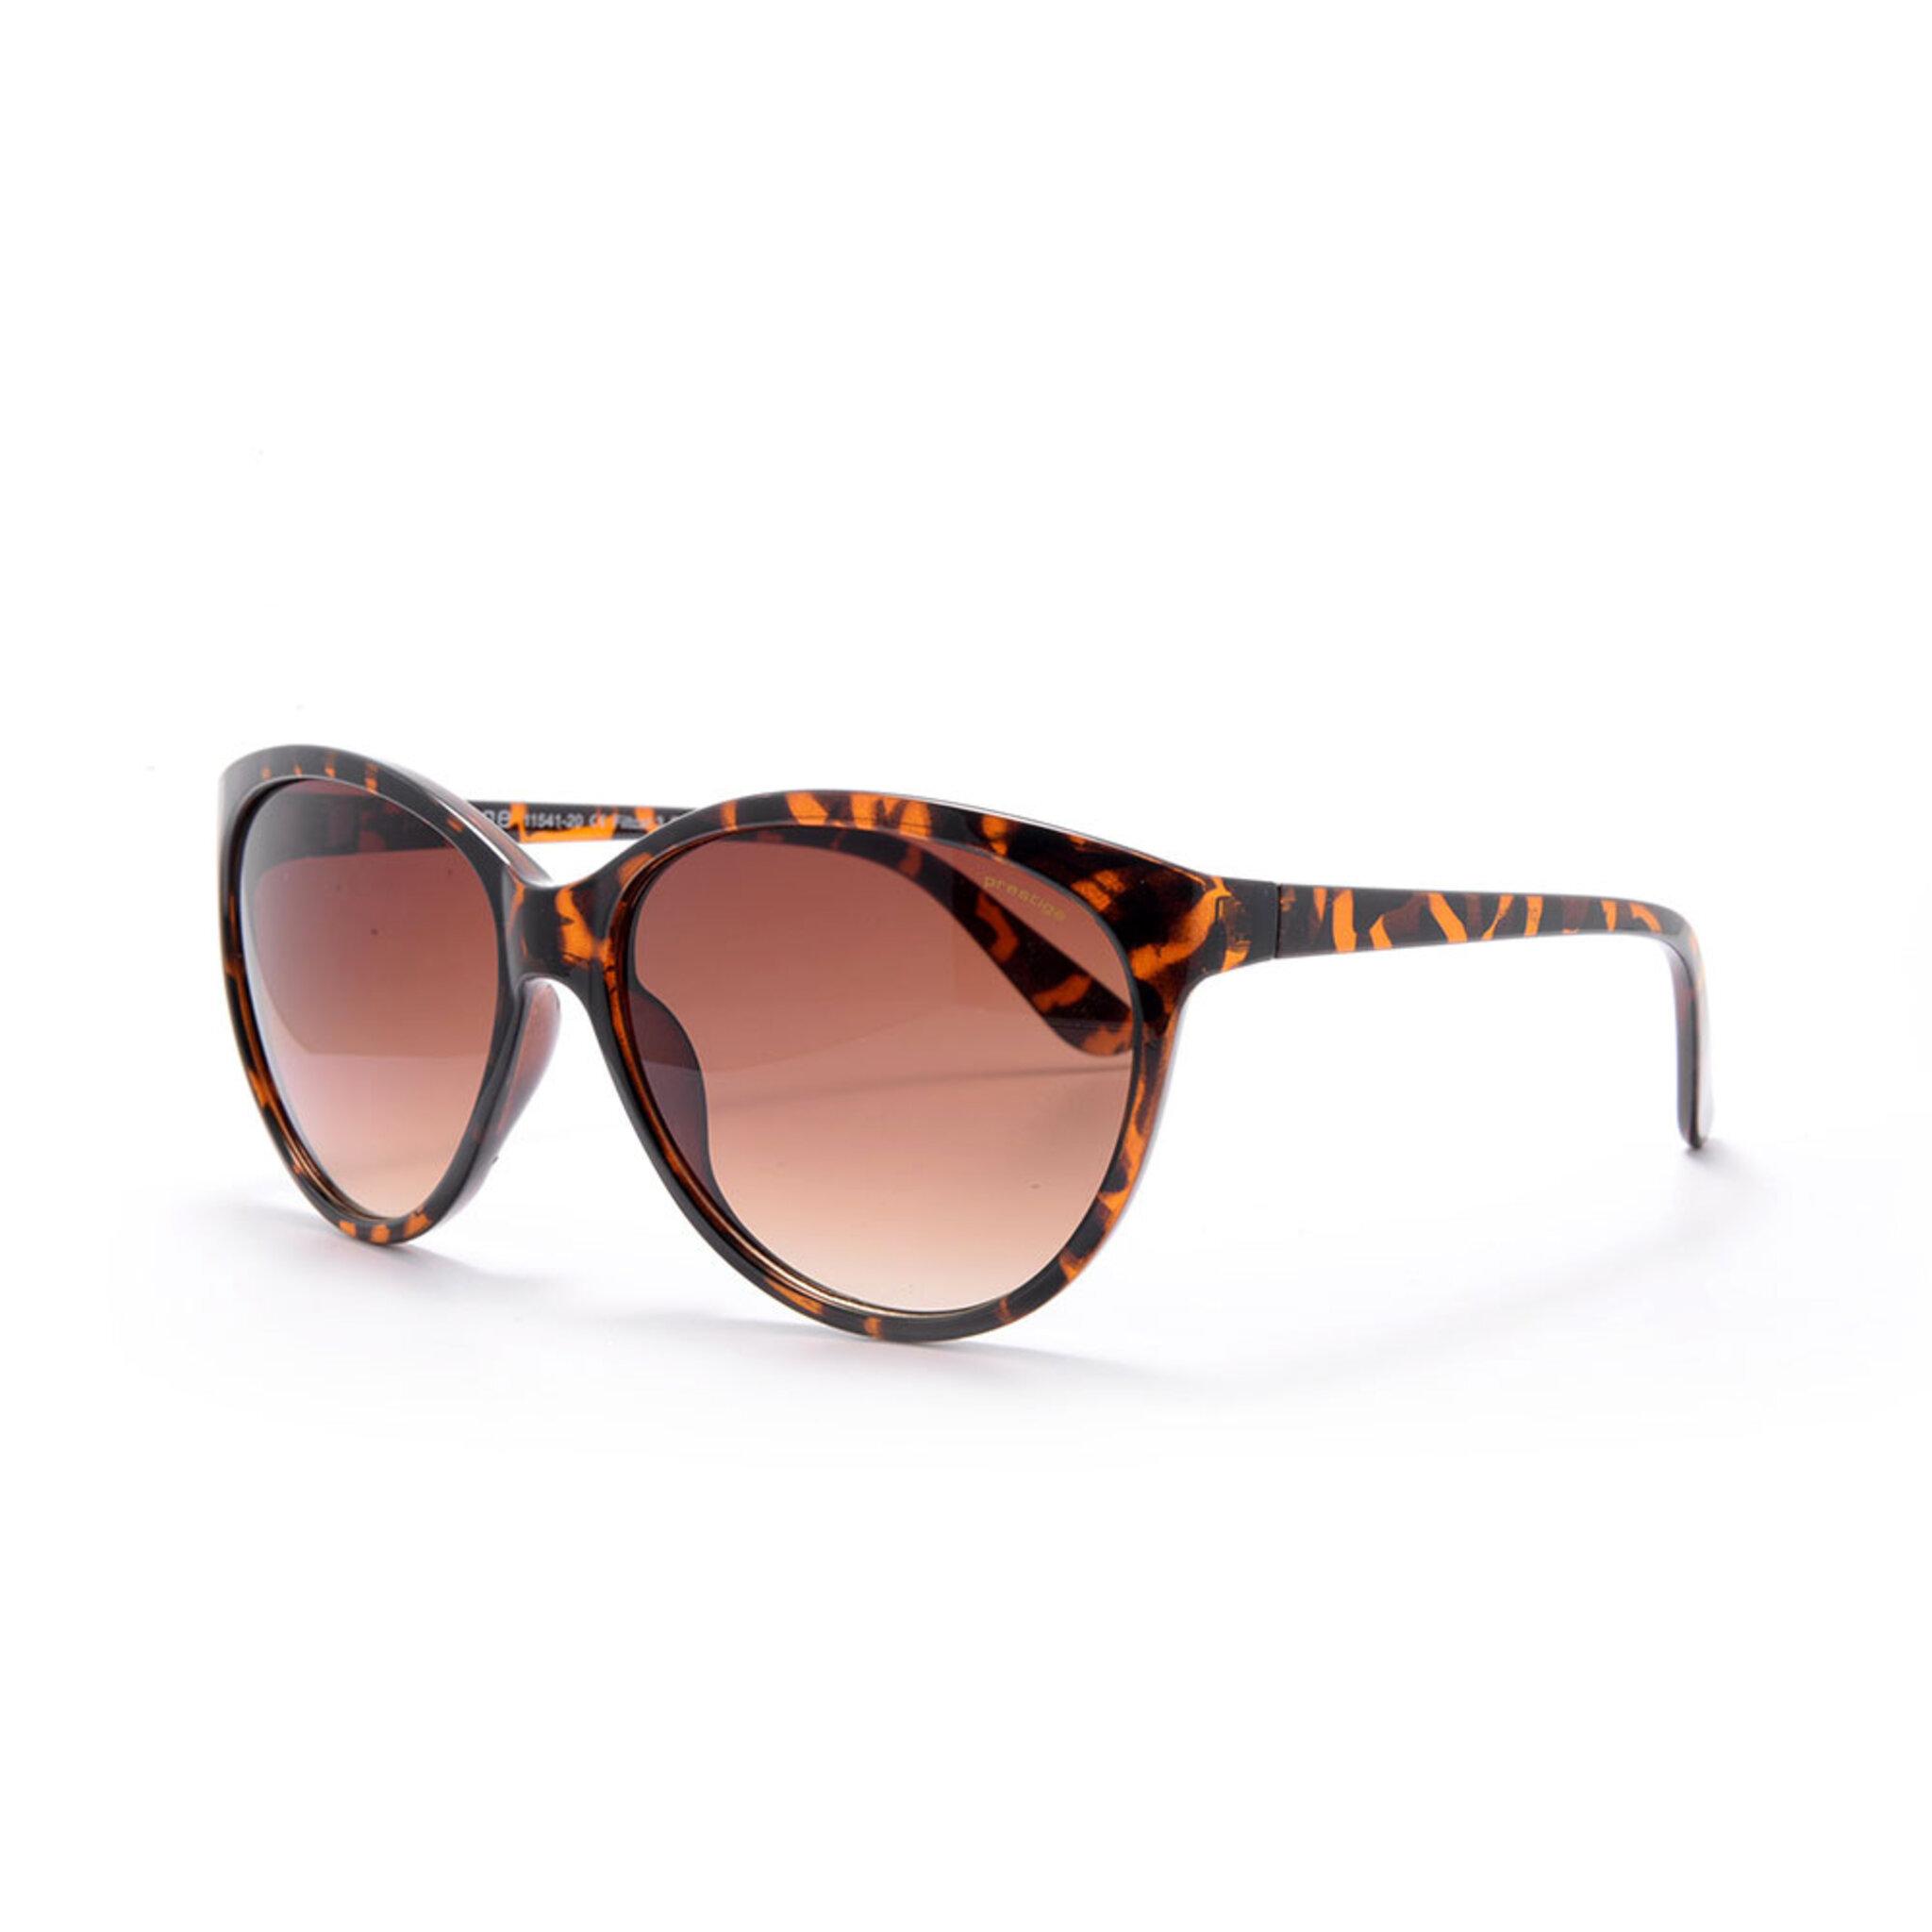 Emery Classic Solglasögon, ONESIZE